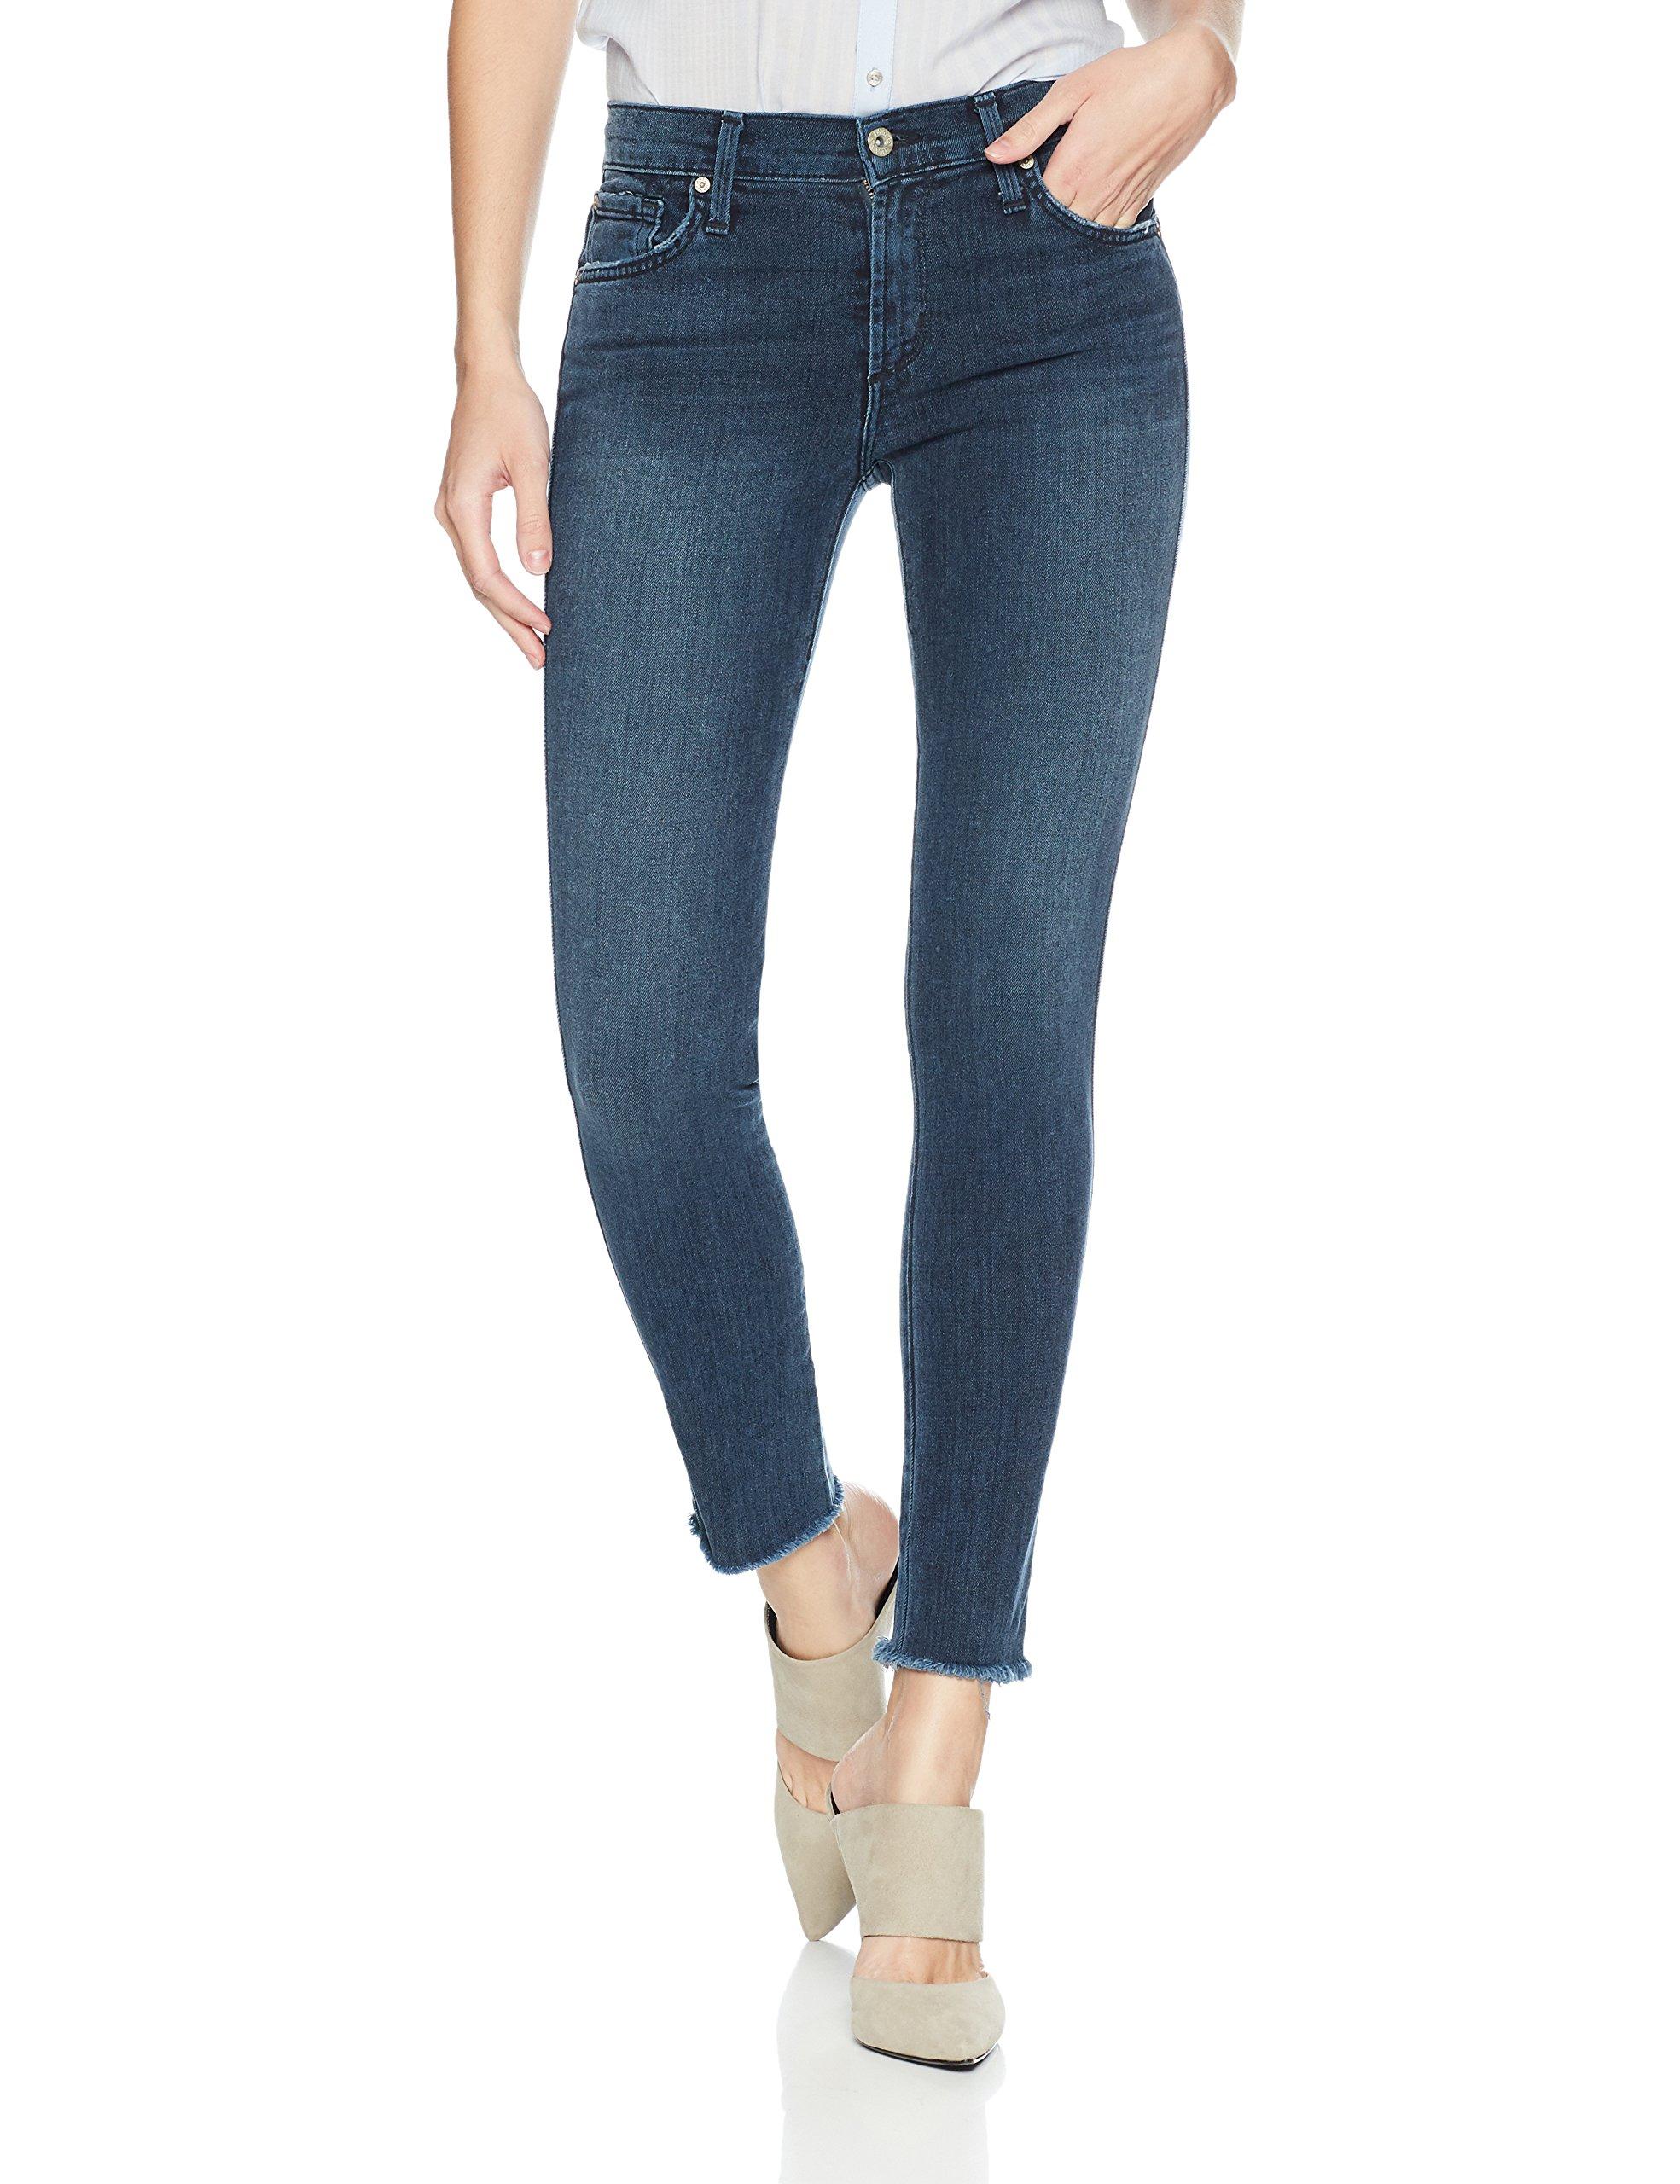 James Jeans Women's Twiggy Ankle Length Skinny Jean In Dynasty Clean, Dynasty CLN, 25